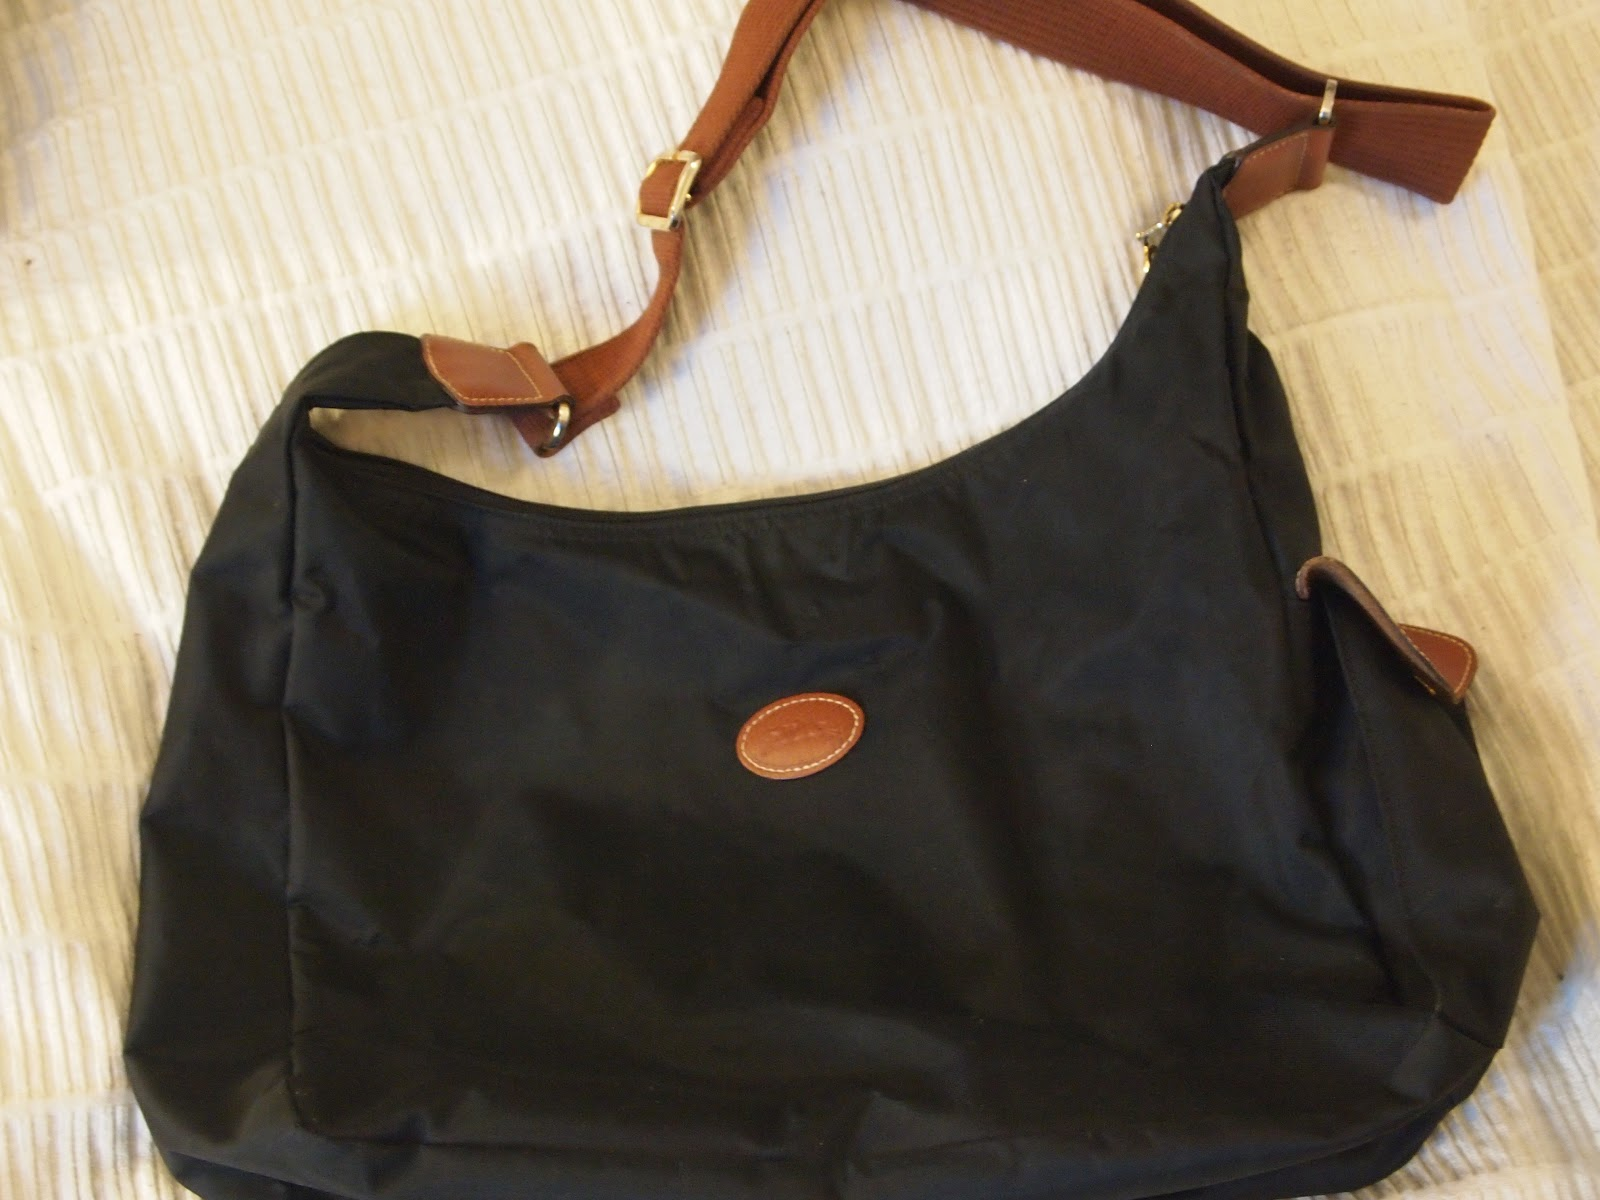 Nahkaiset Longchamp Laukut : Xl el?m?? all my longchamps